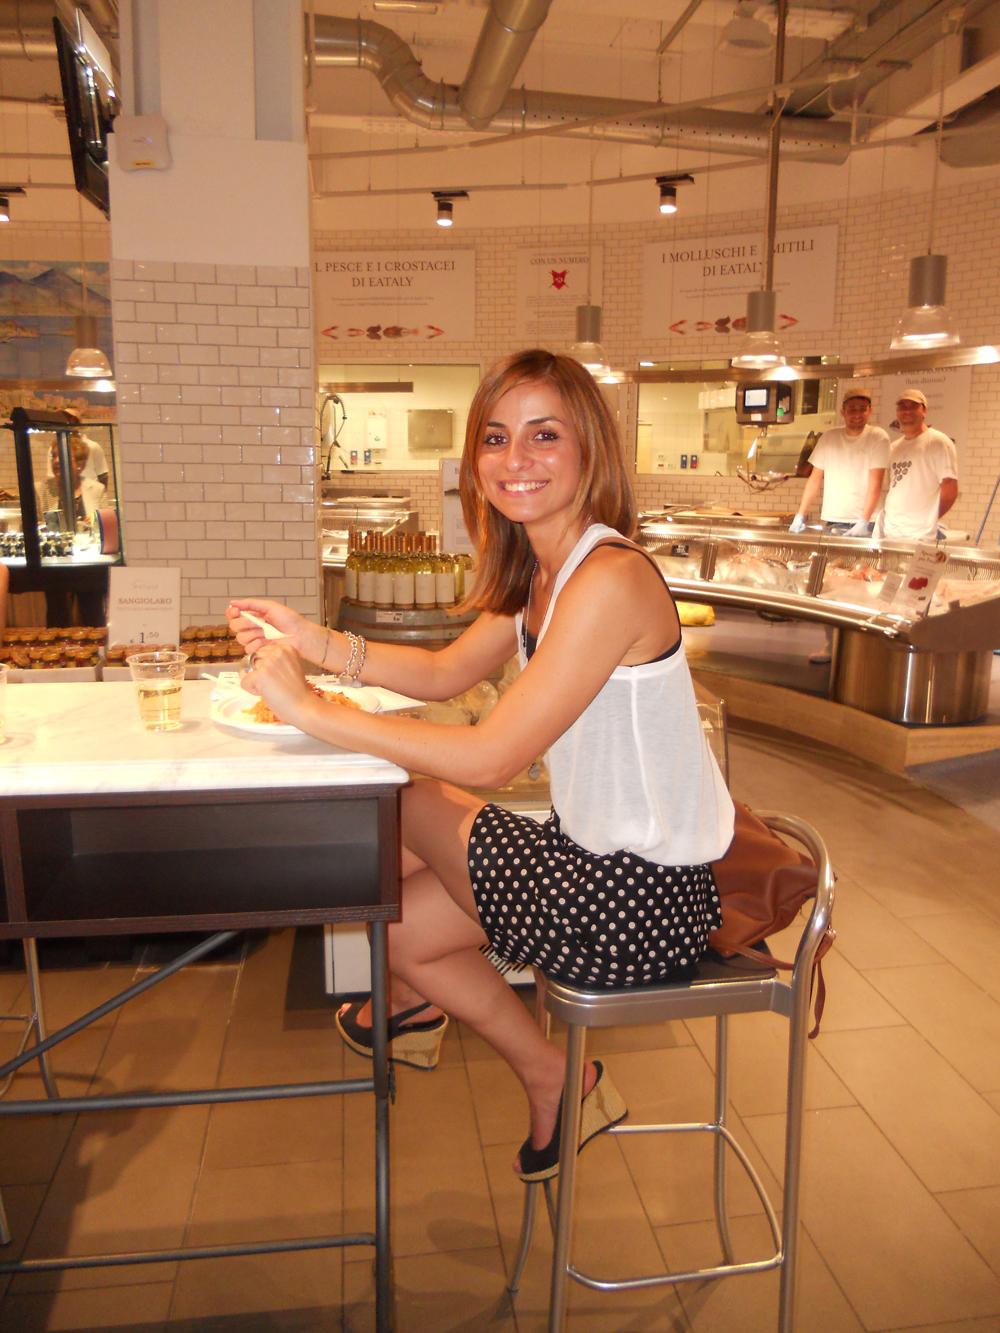 La cucina romana in scena da eataly for Cucina romana